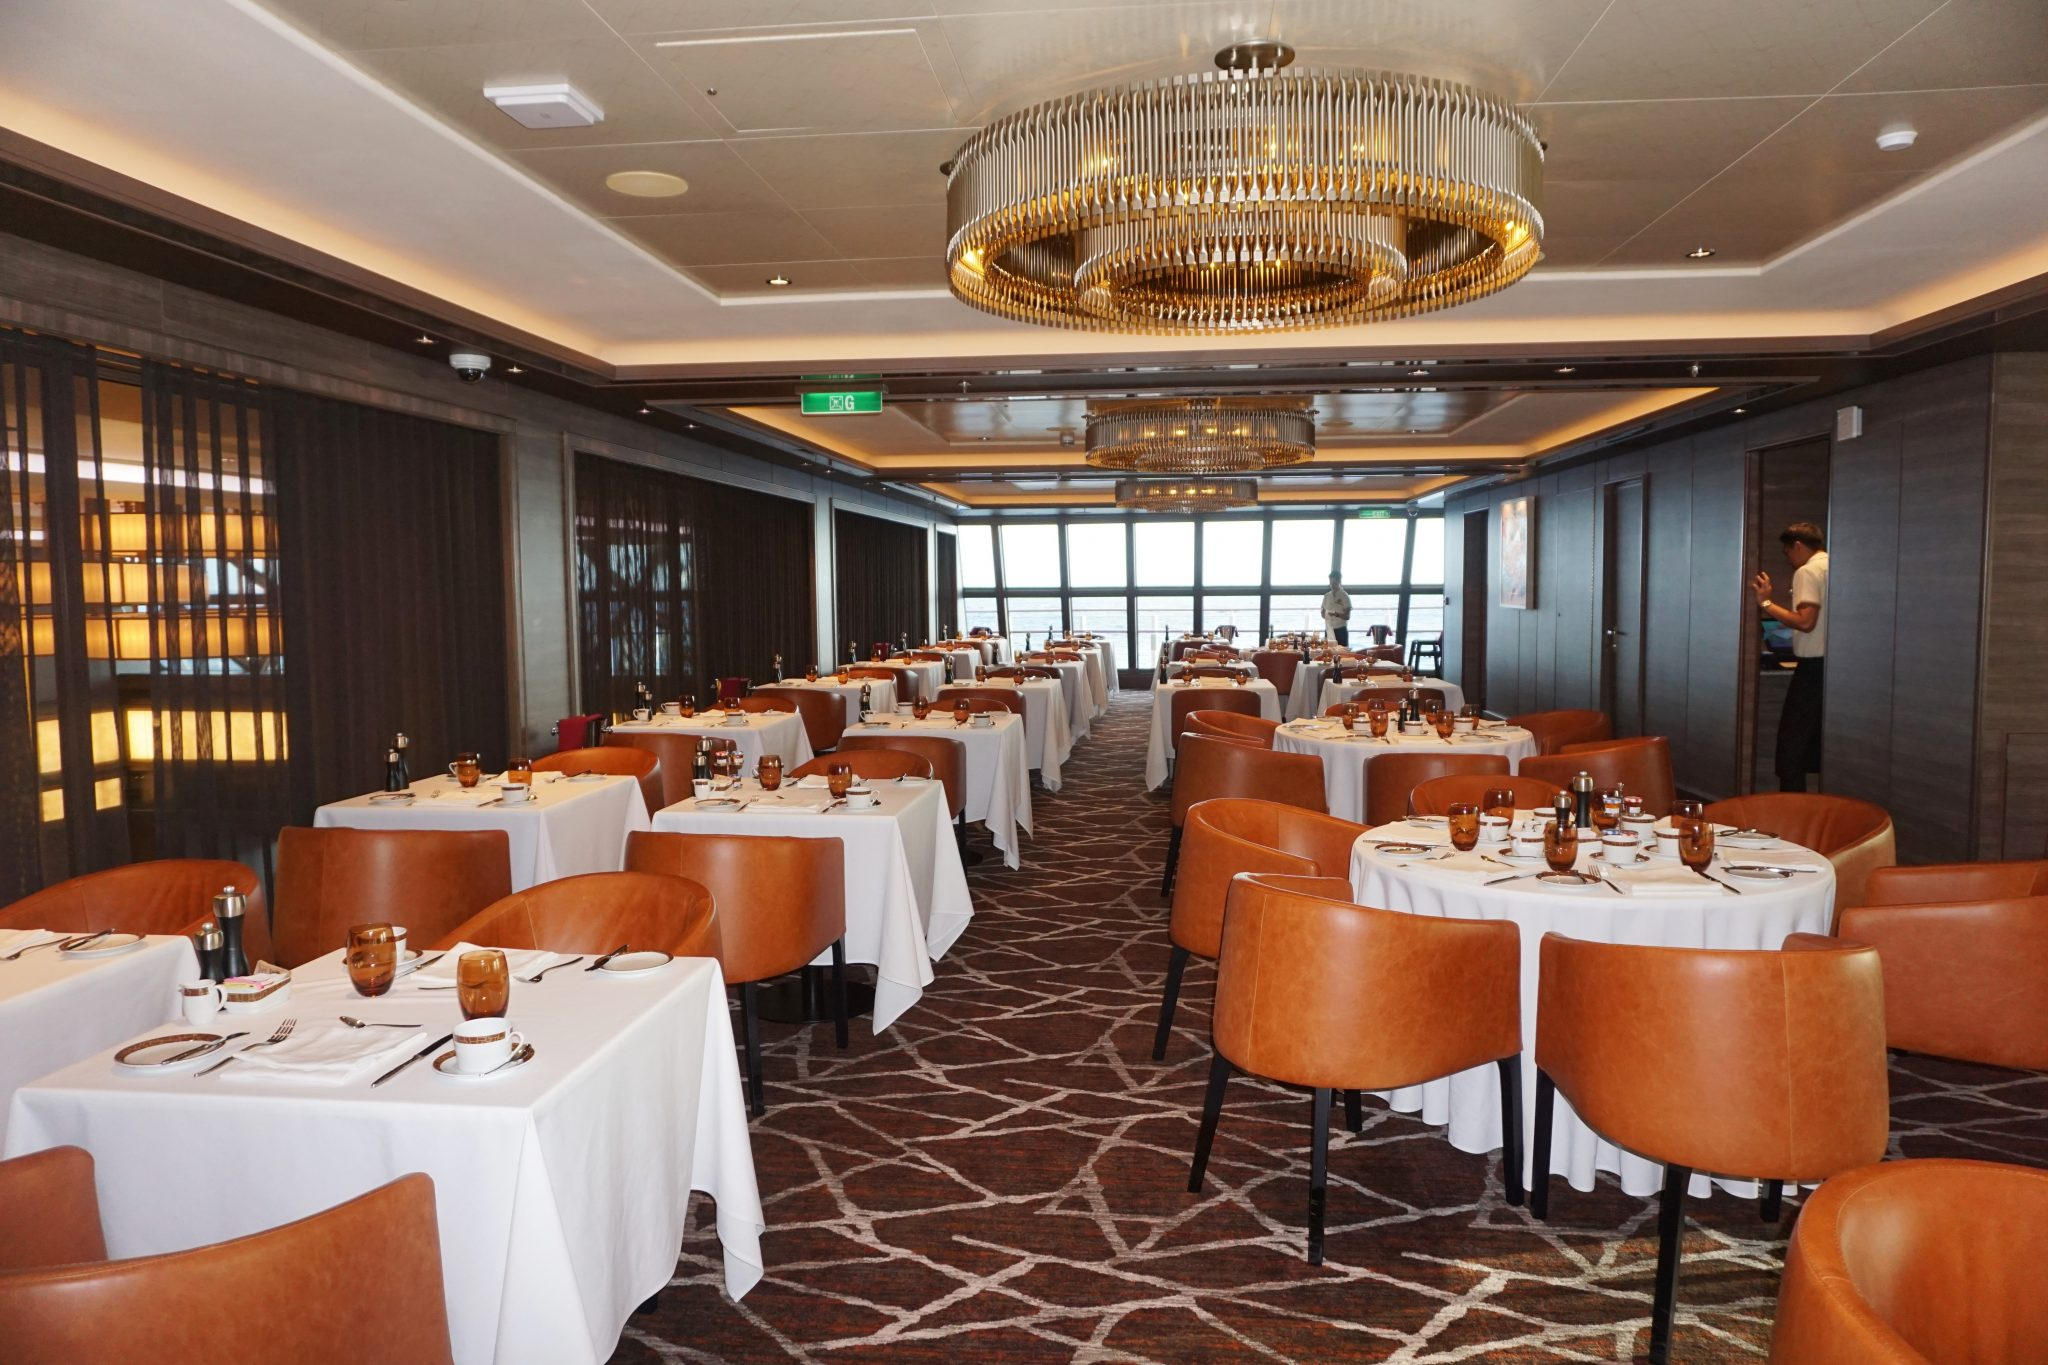 Norwegian Encore Restaurant Menus And Dining Guide Eatsleepcruise Com